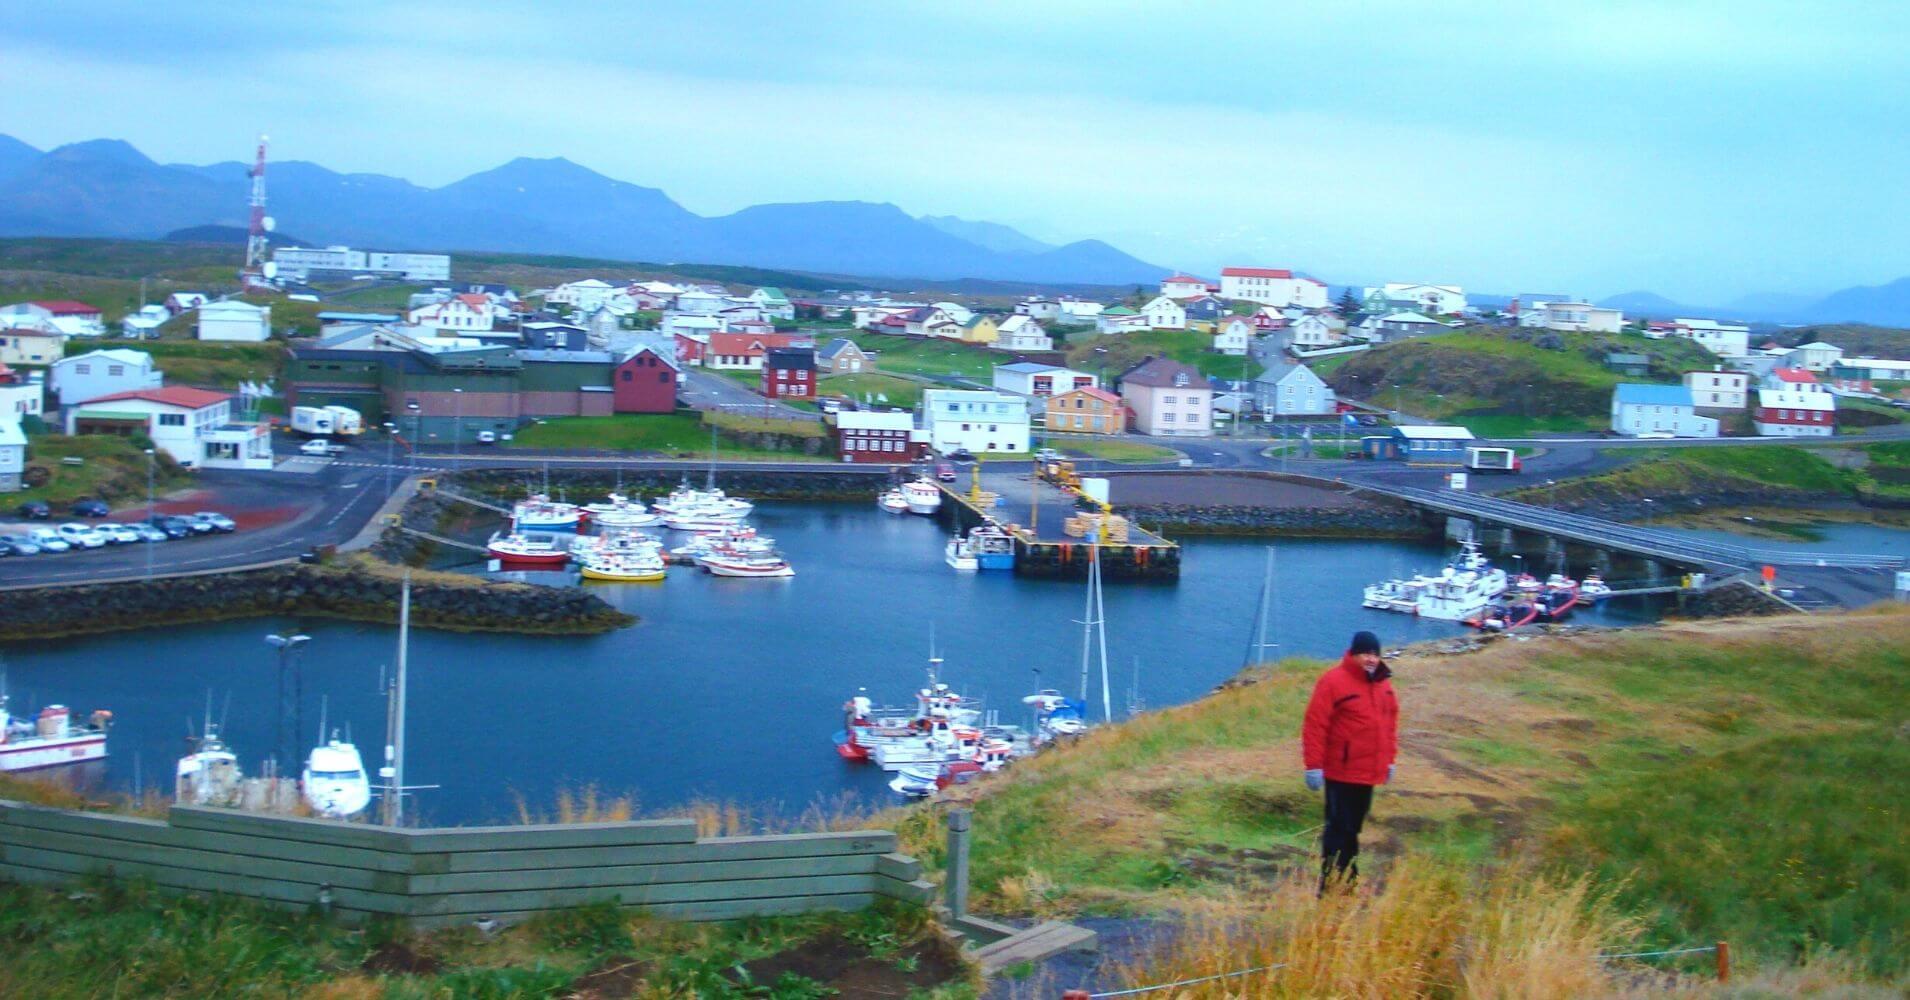 Ísafjörður. Fiordos del Oeste, Vestfirðir. Islandia.